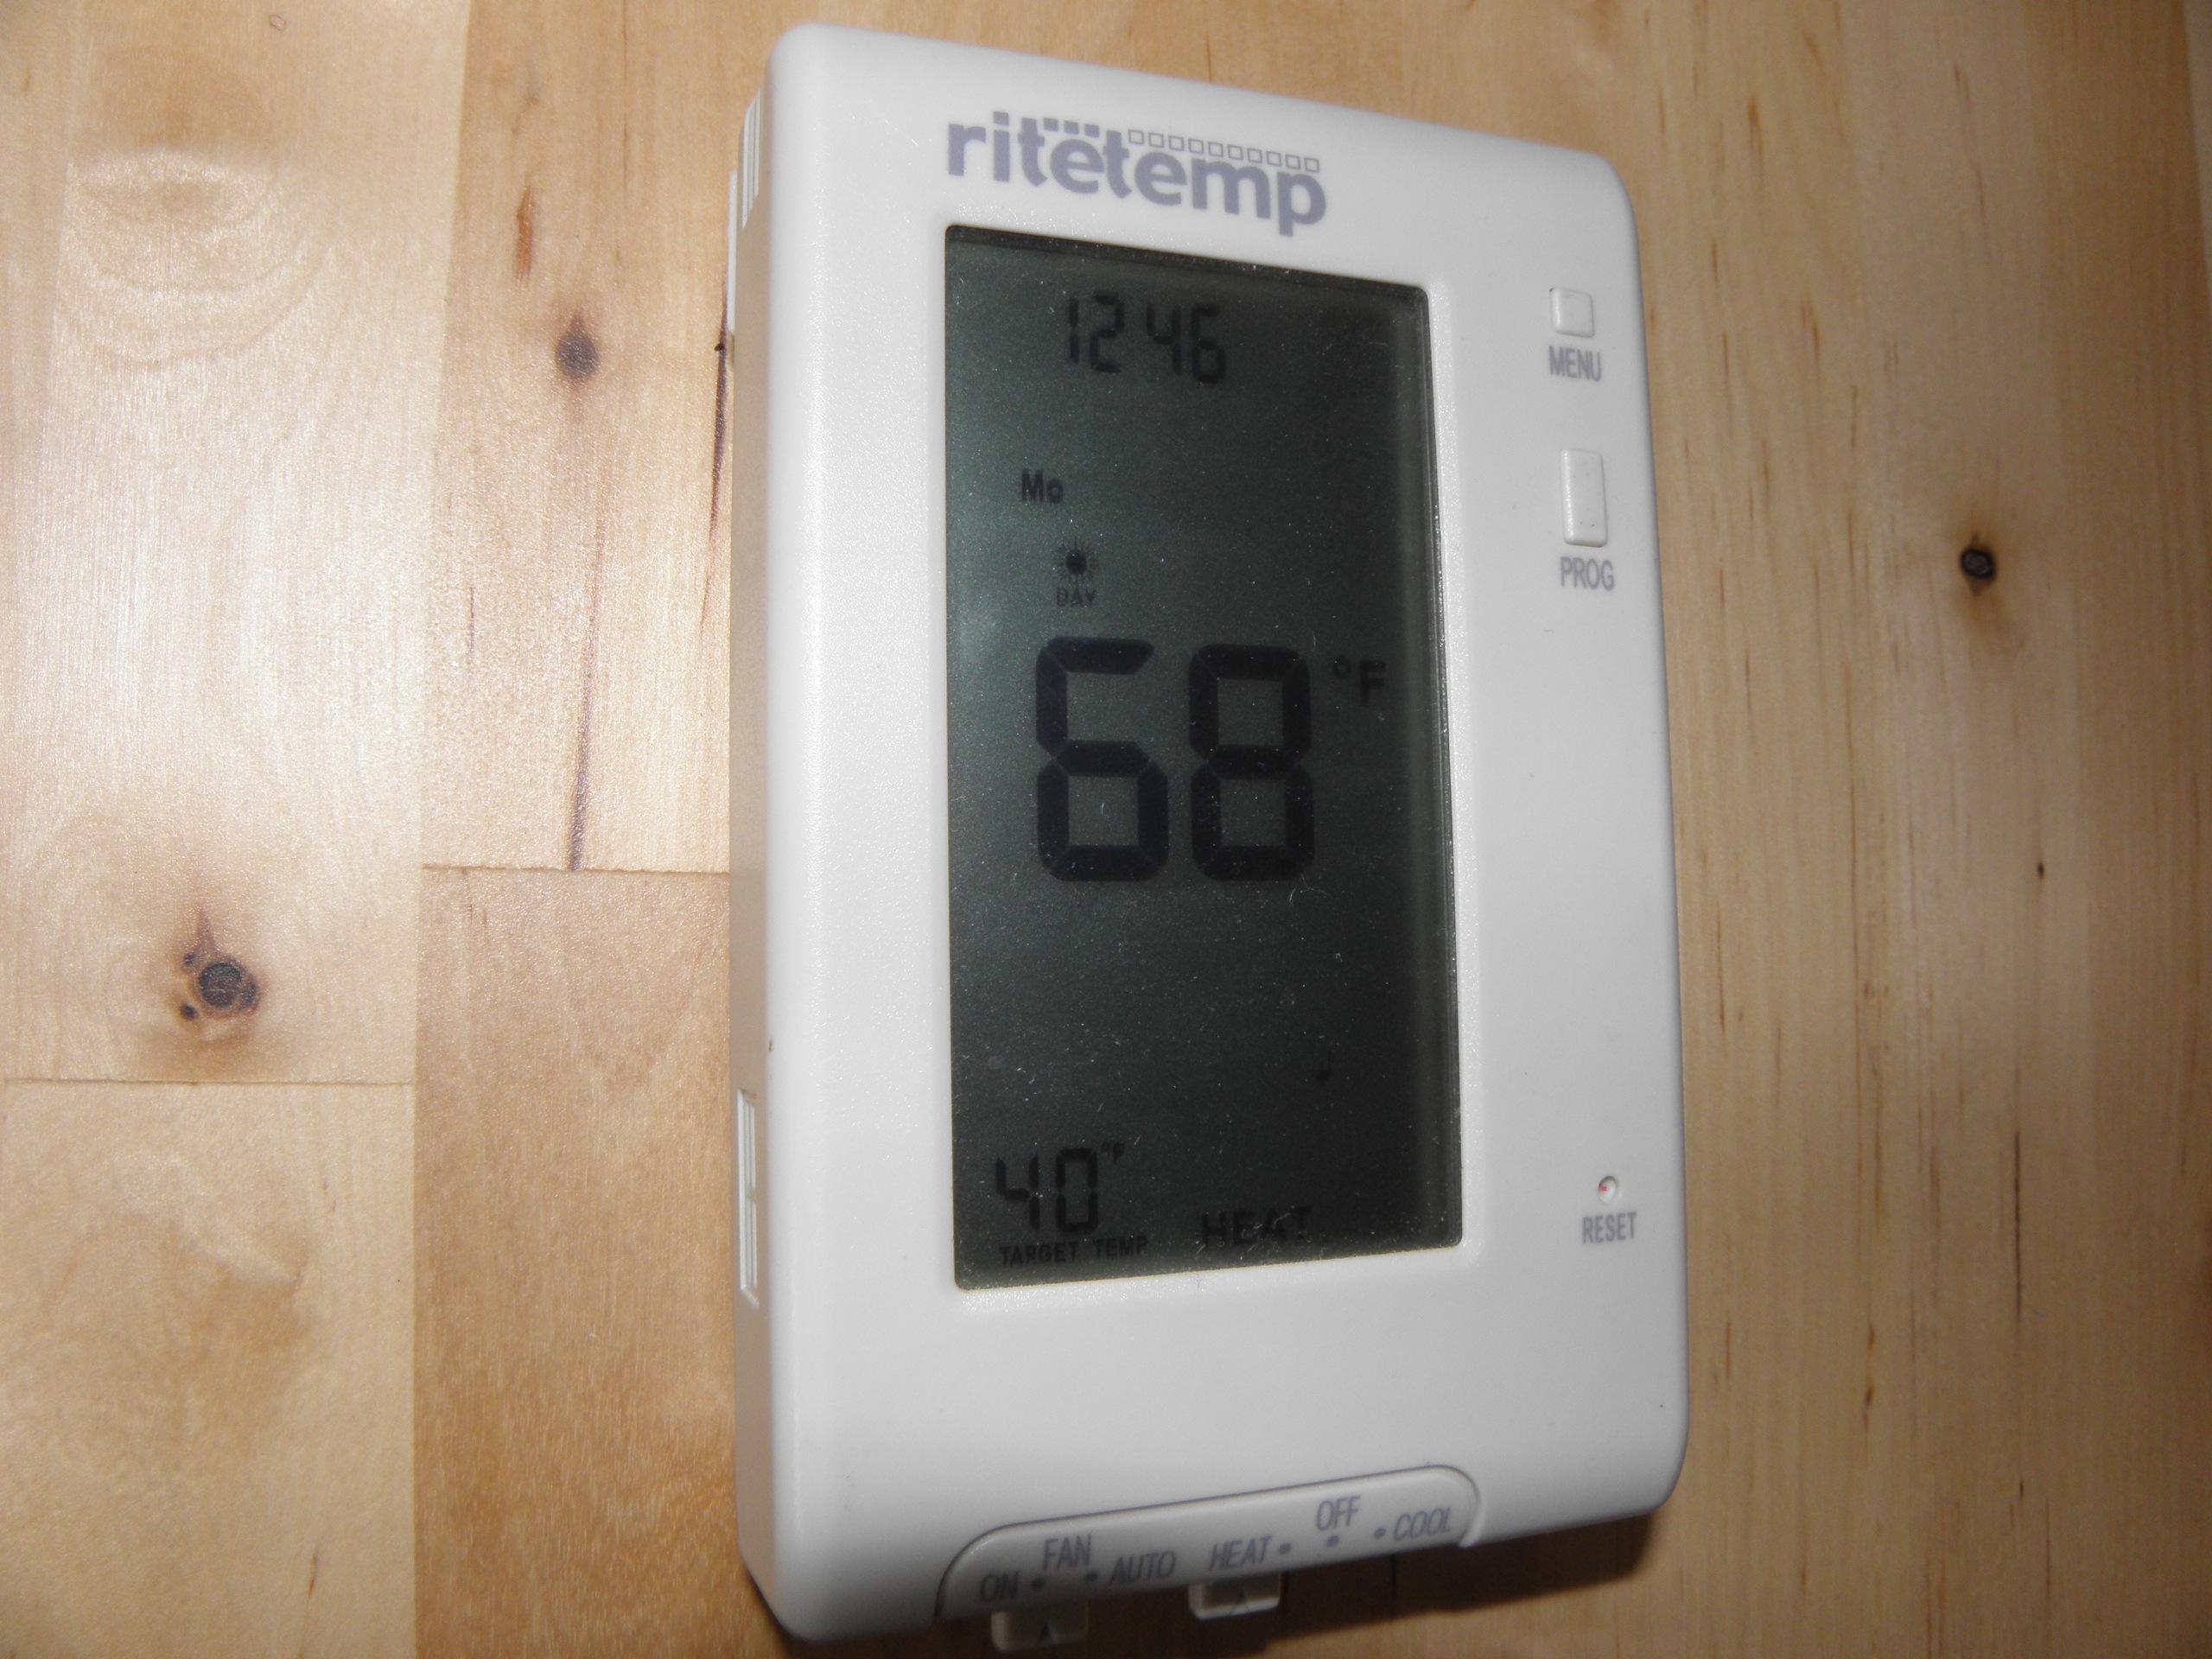 ritetemp 8022 thermostat wiring diagram where is your gallbladder braeburn